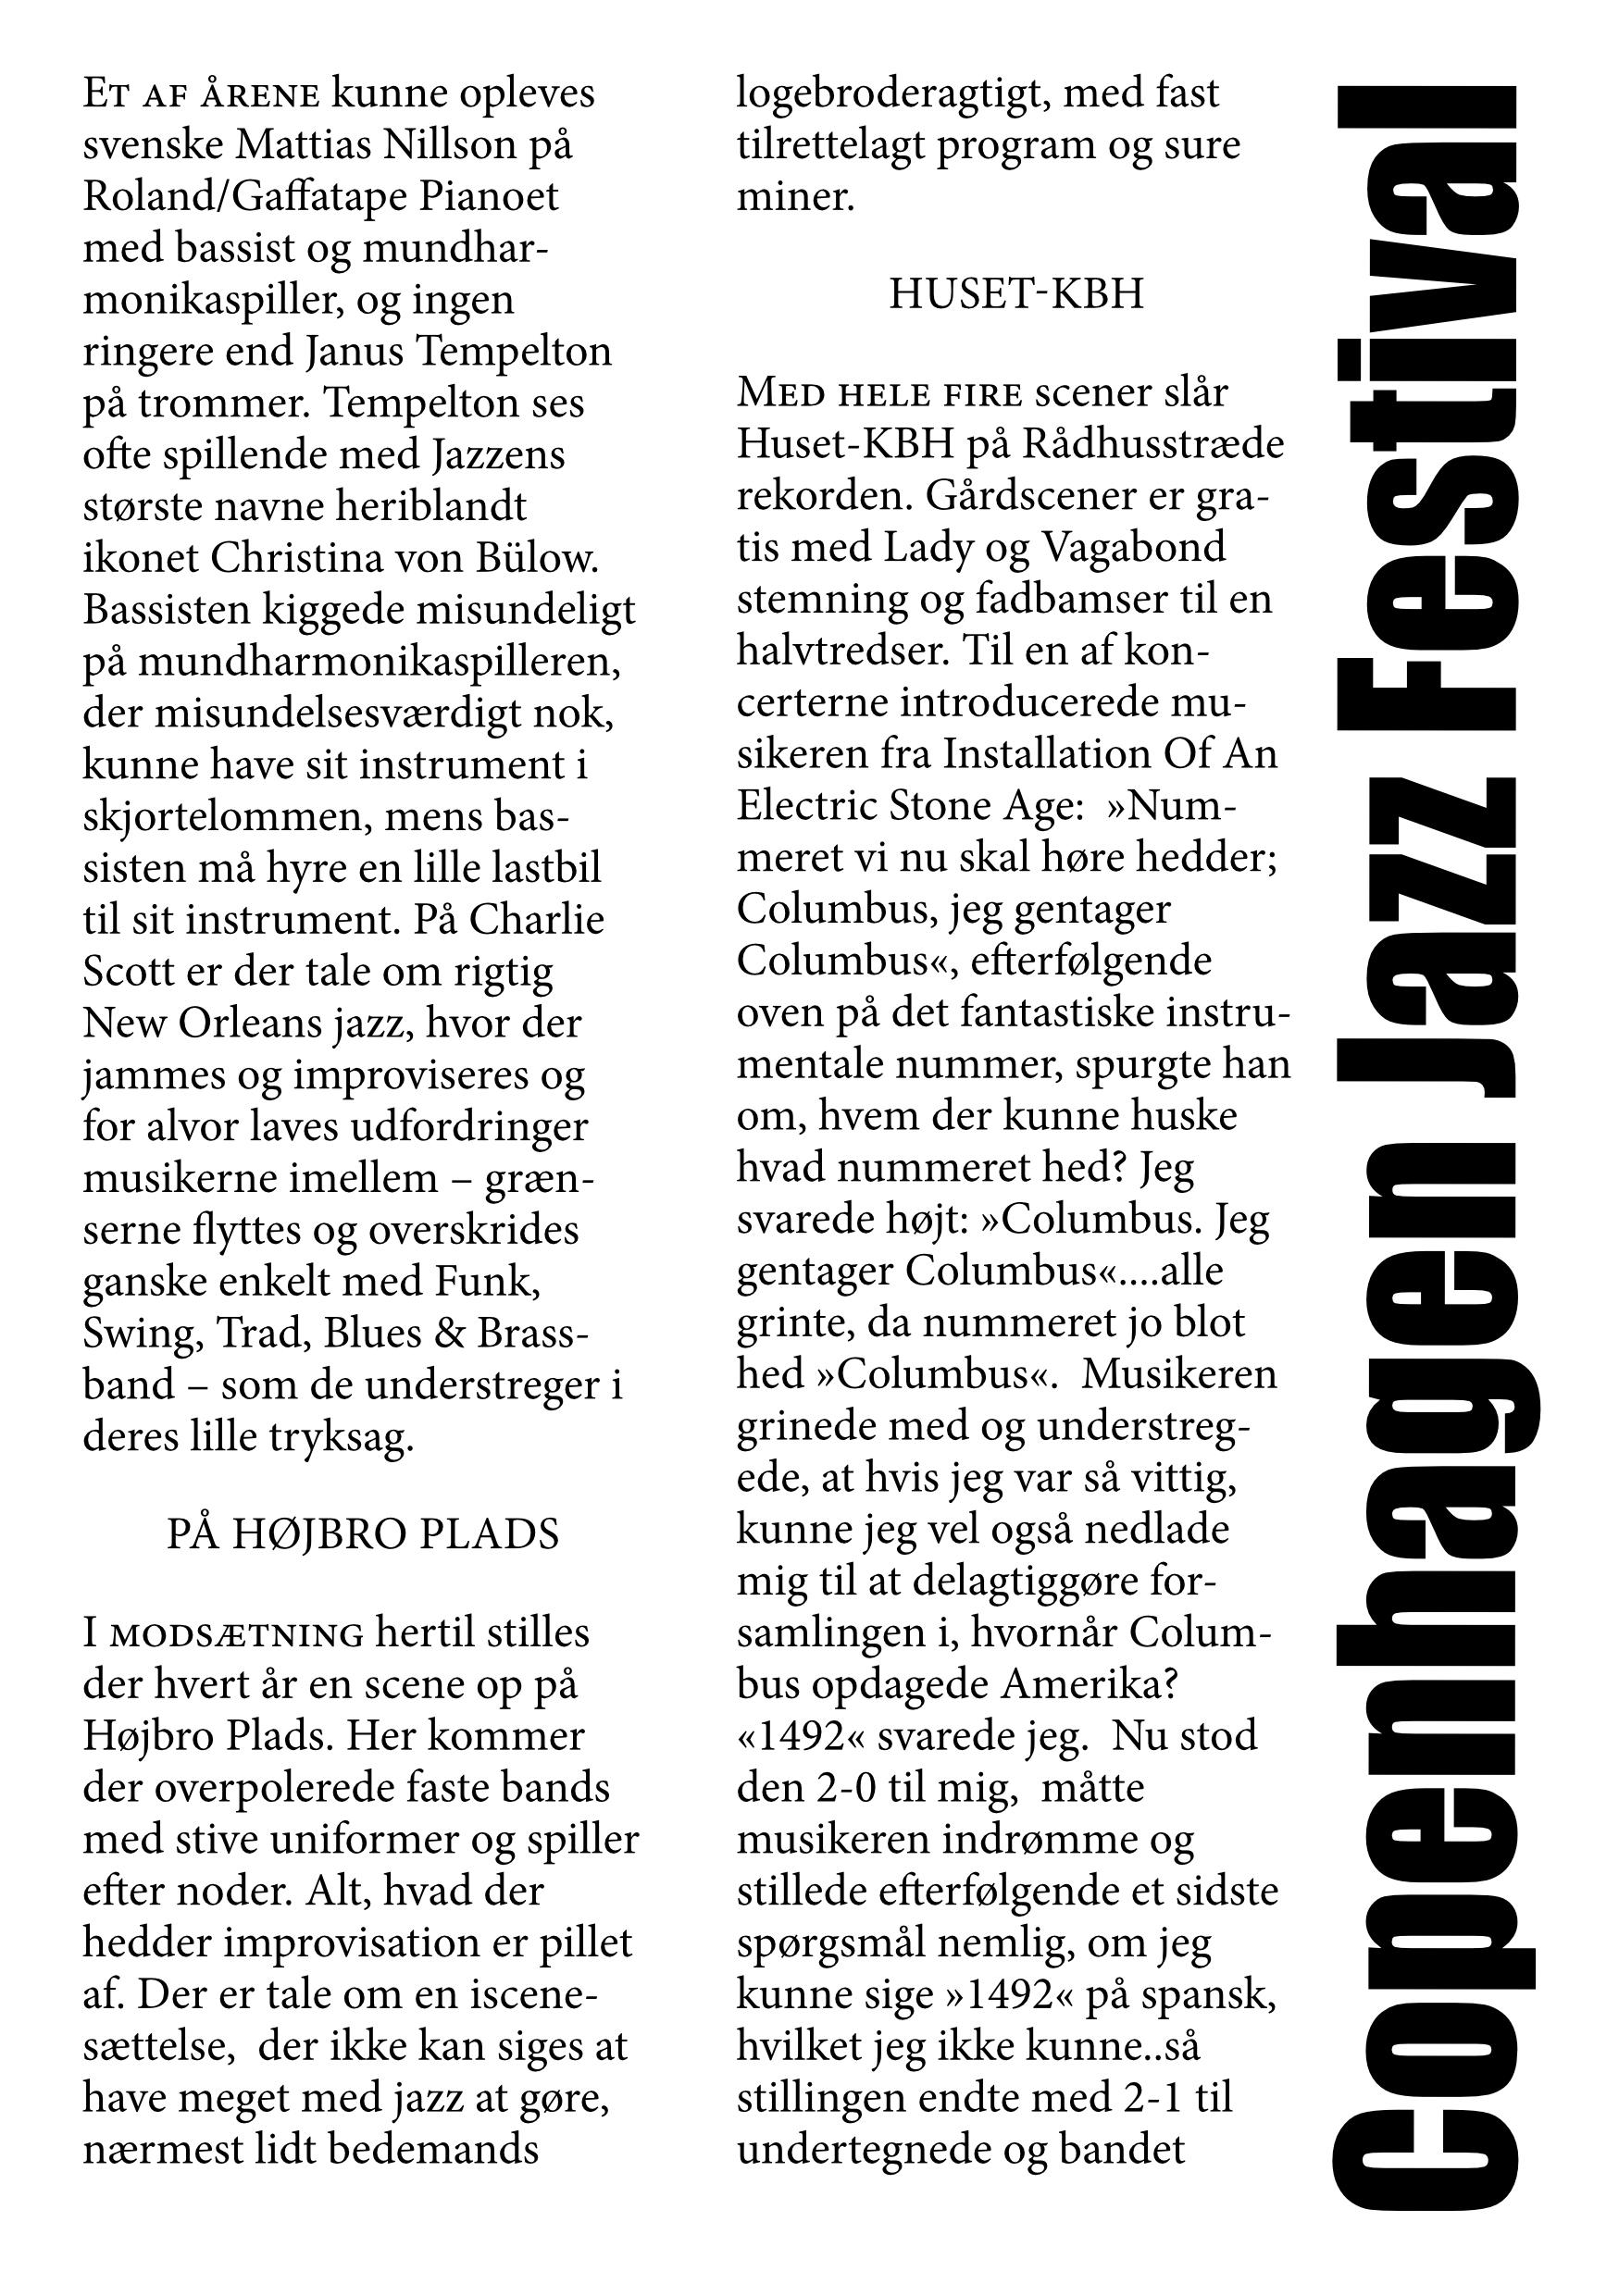 Copenhagen Jazz Festival 2021